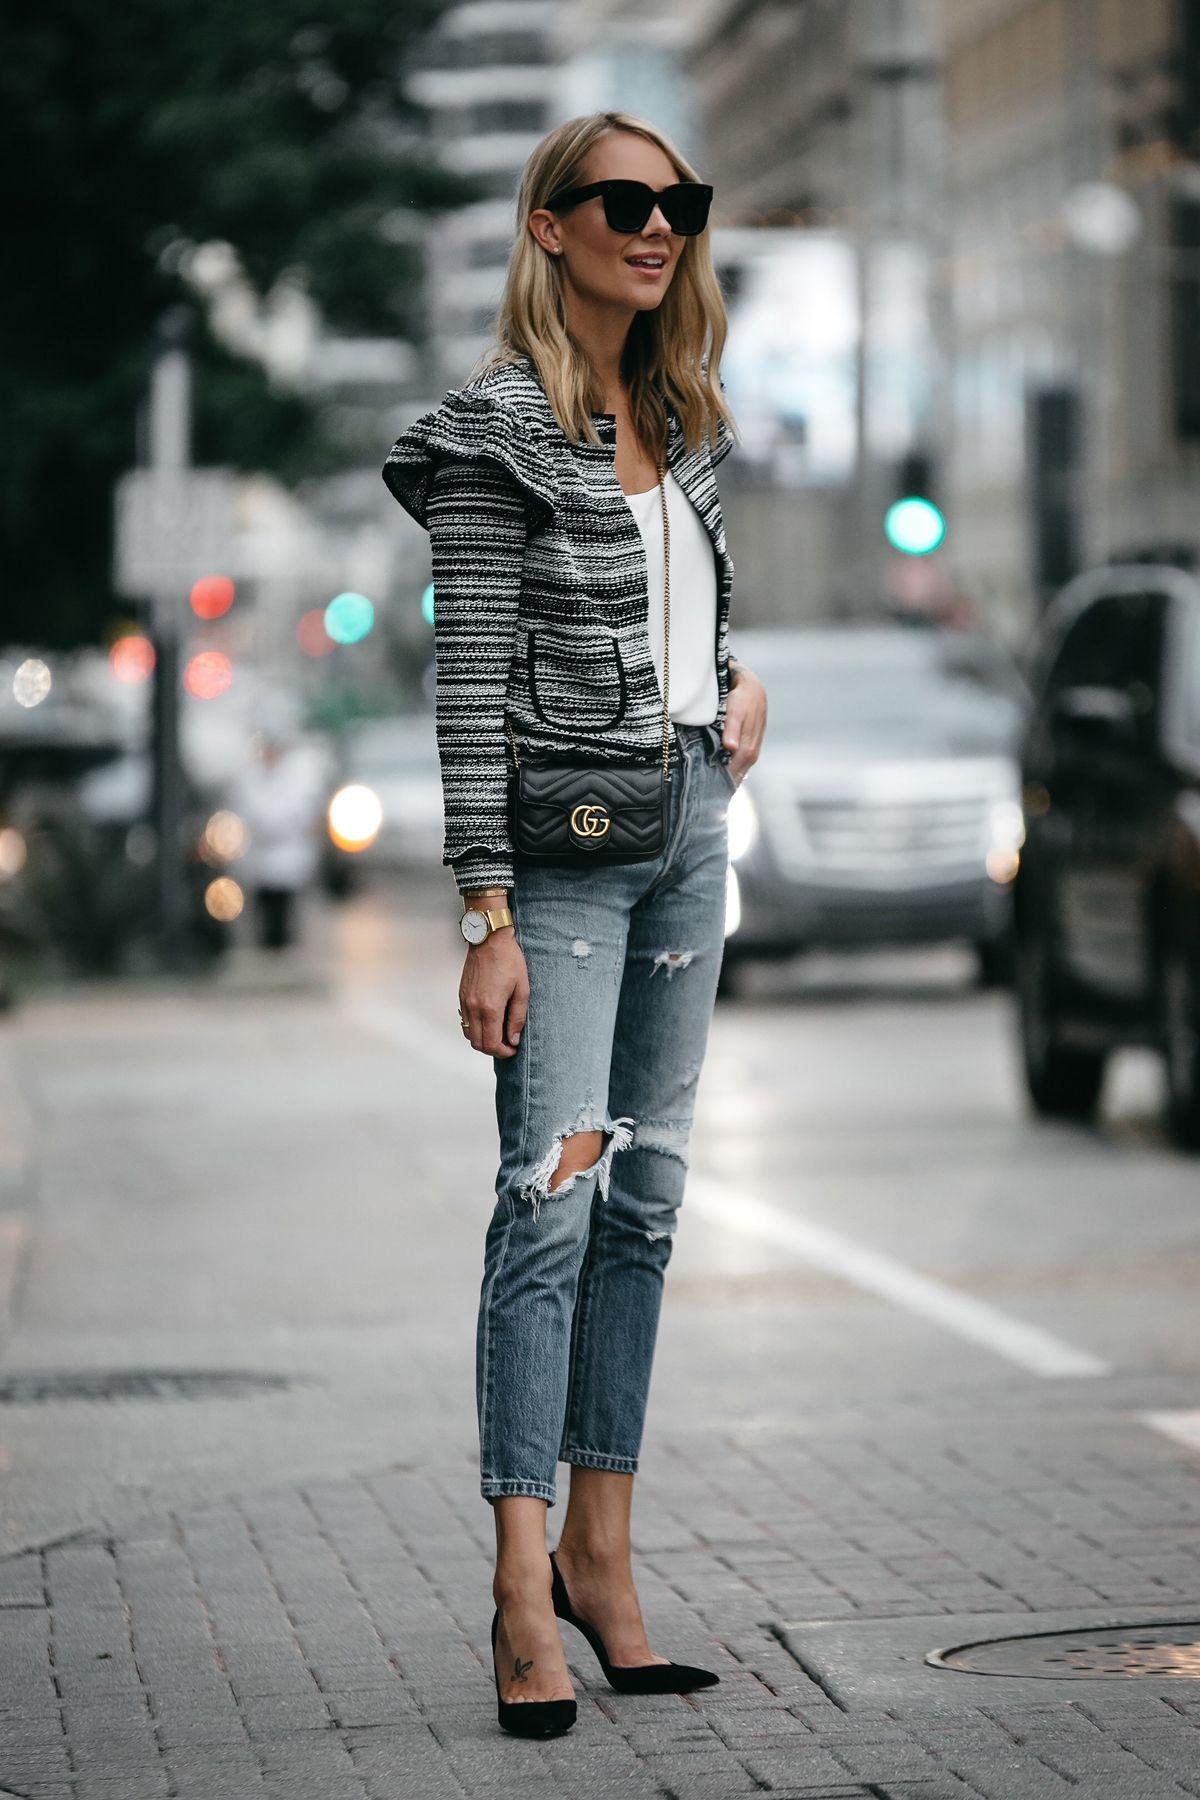 e227b1c351 Blonde Woman Wearing Club Monaco Tweed Jacket Denim Ripped Jeans Gucci Mini  Marmont Handbag Black Pumps Fashion Jackson Dallas Blogger Fashion Blogger  ...